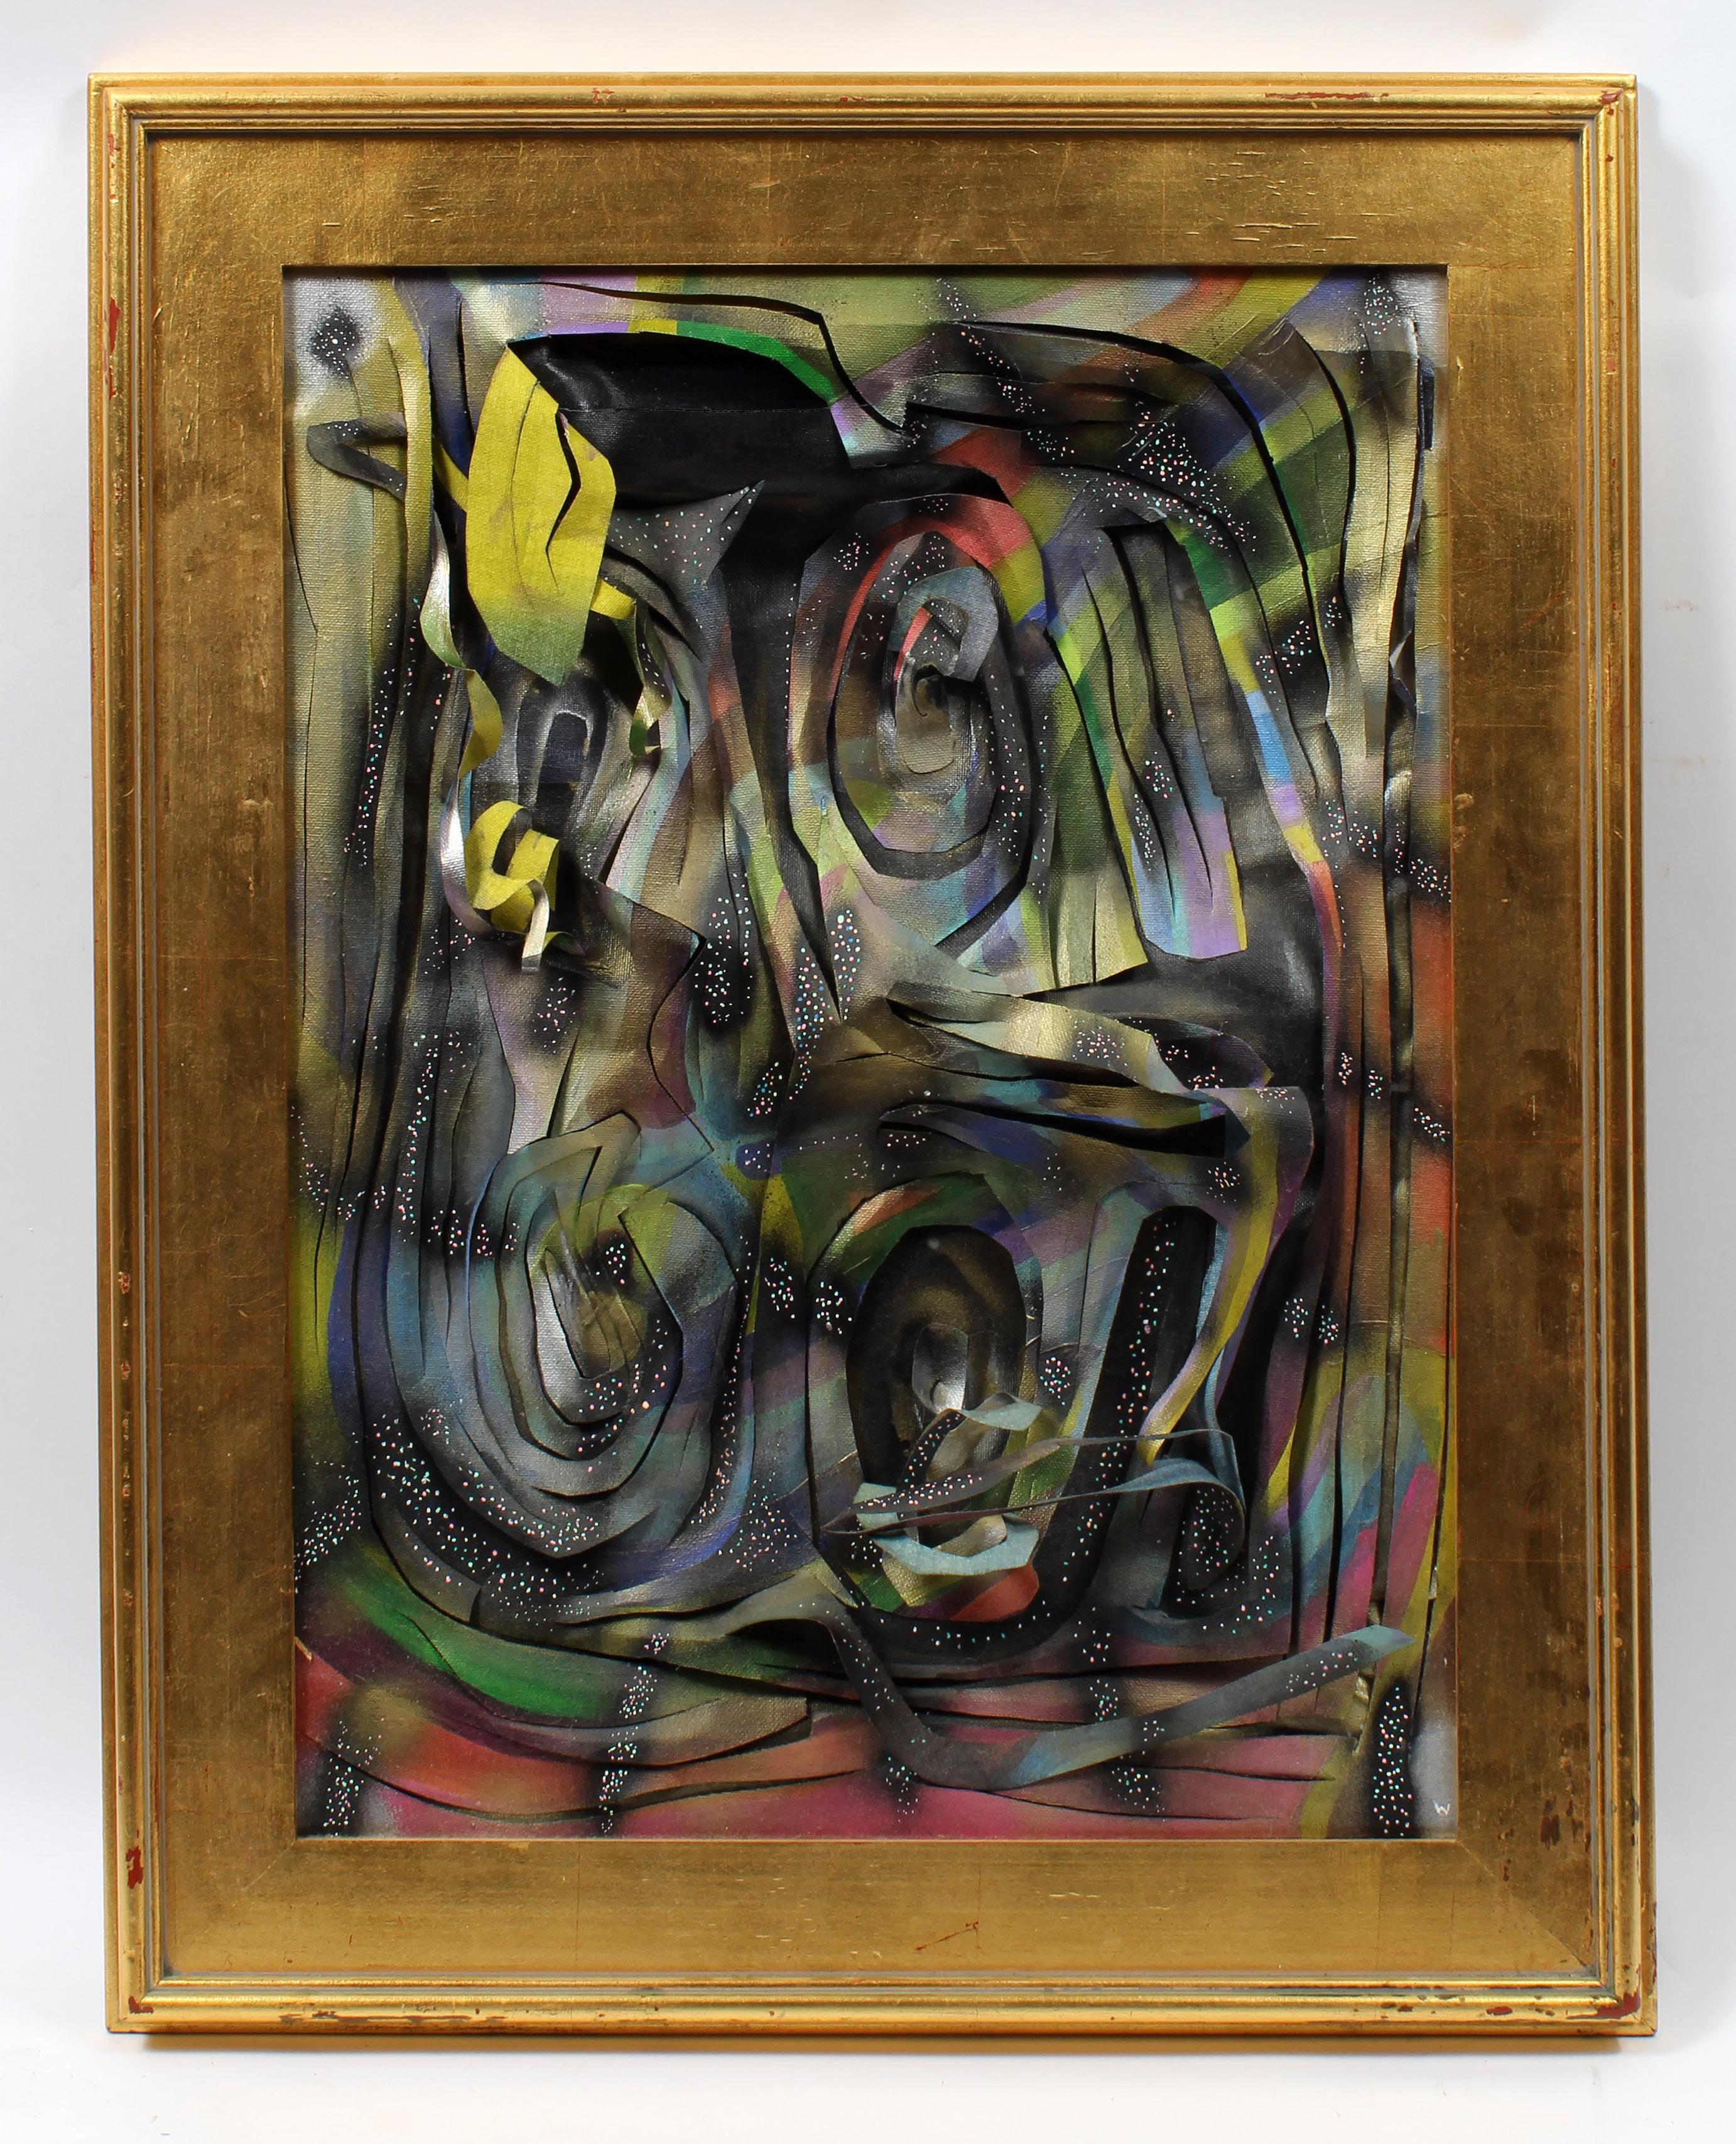 American Emerging Contemporary Artist Sculptural Canvas Framed Spray Paint